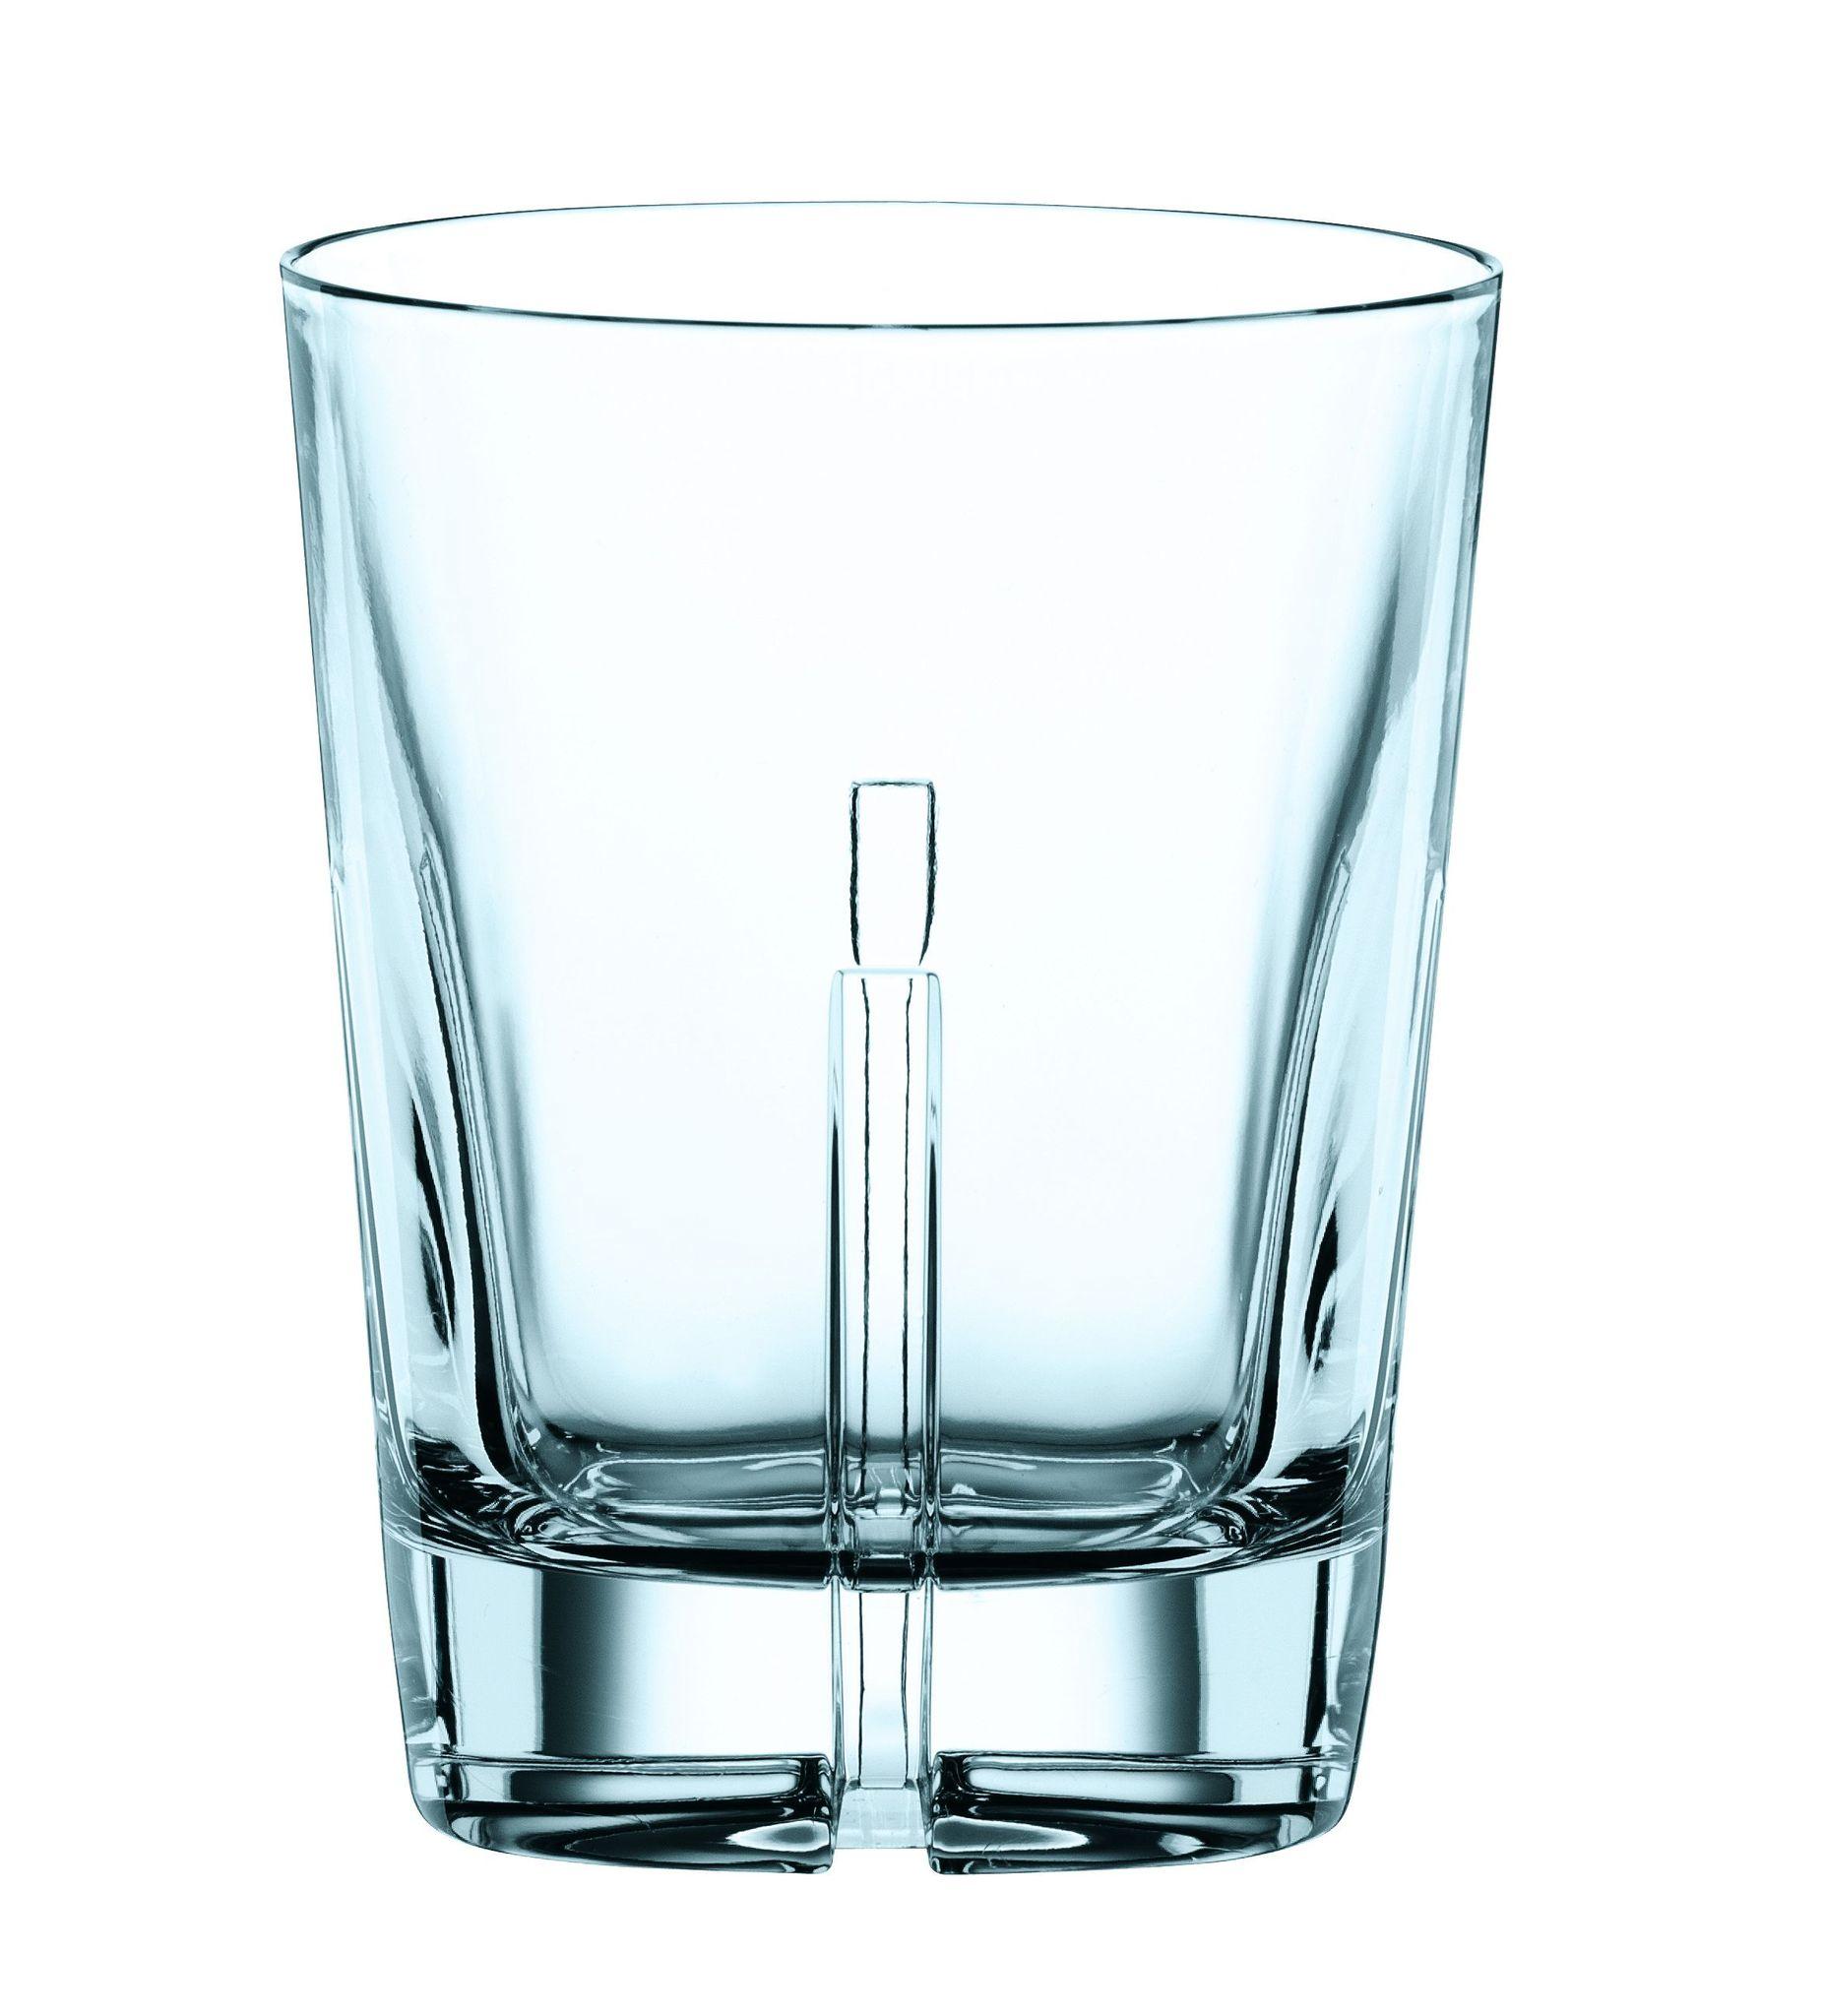 Стаканы Набор стаканов для виски 4шт 345мл Nachtmann Havanna Whisky Tumbler stakan-dlya-viski-345ml-nachtmann-havanna-whisky-tumbler-germaniya.jpg